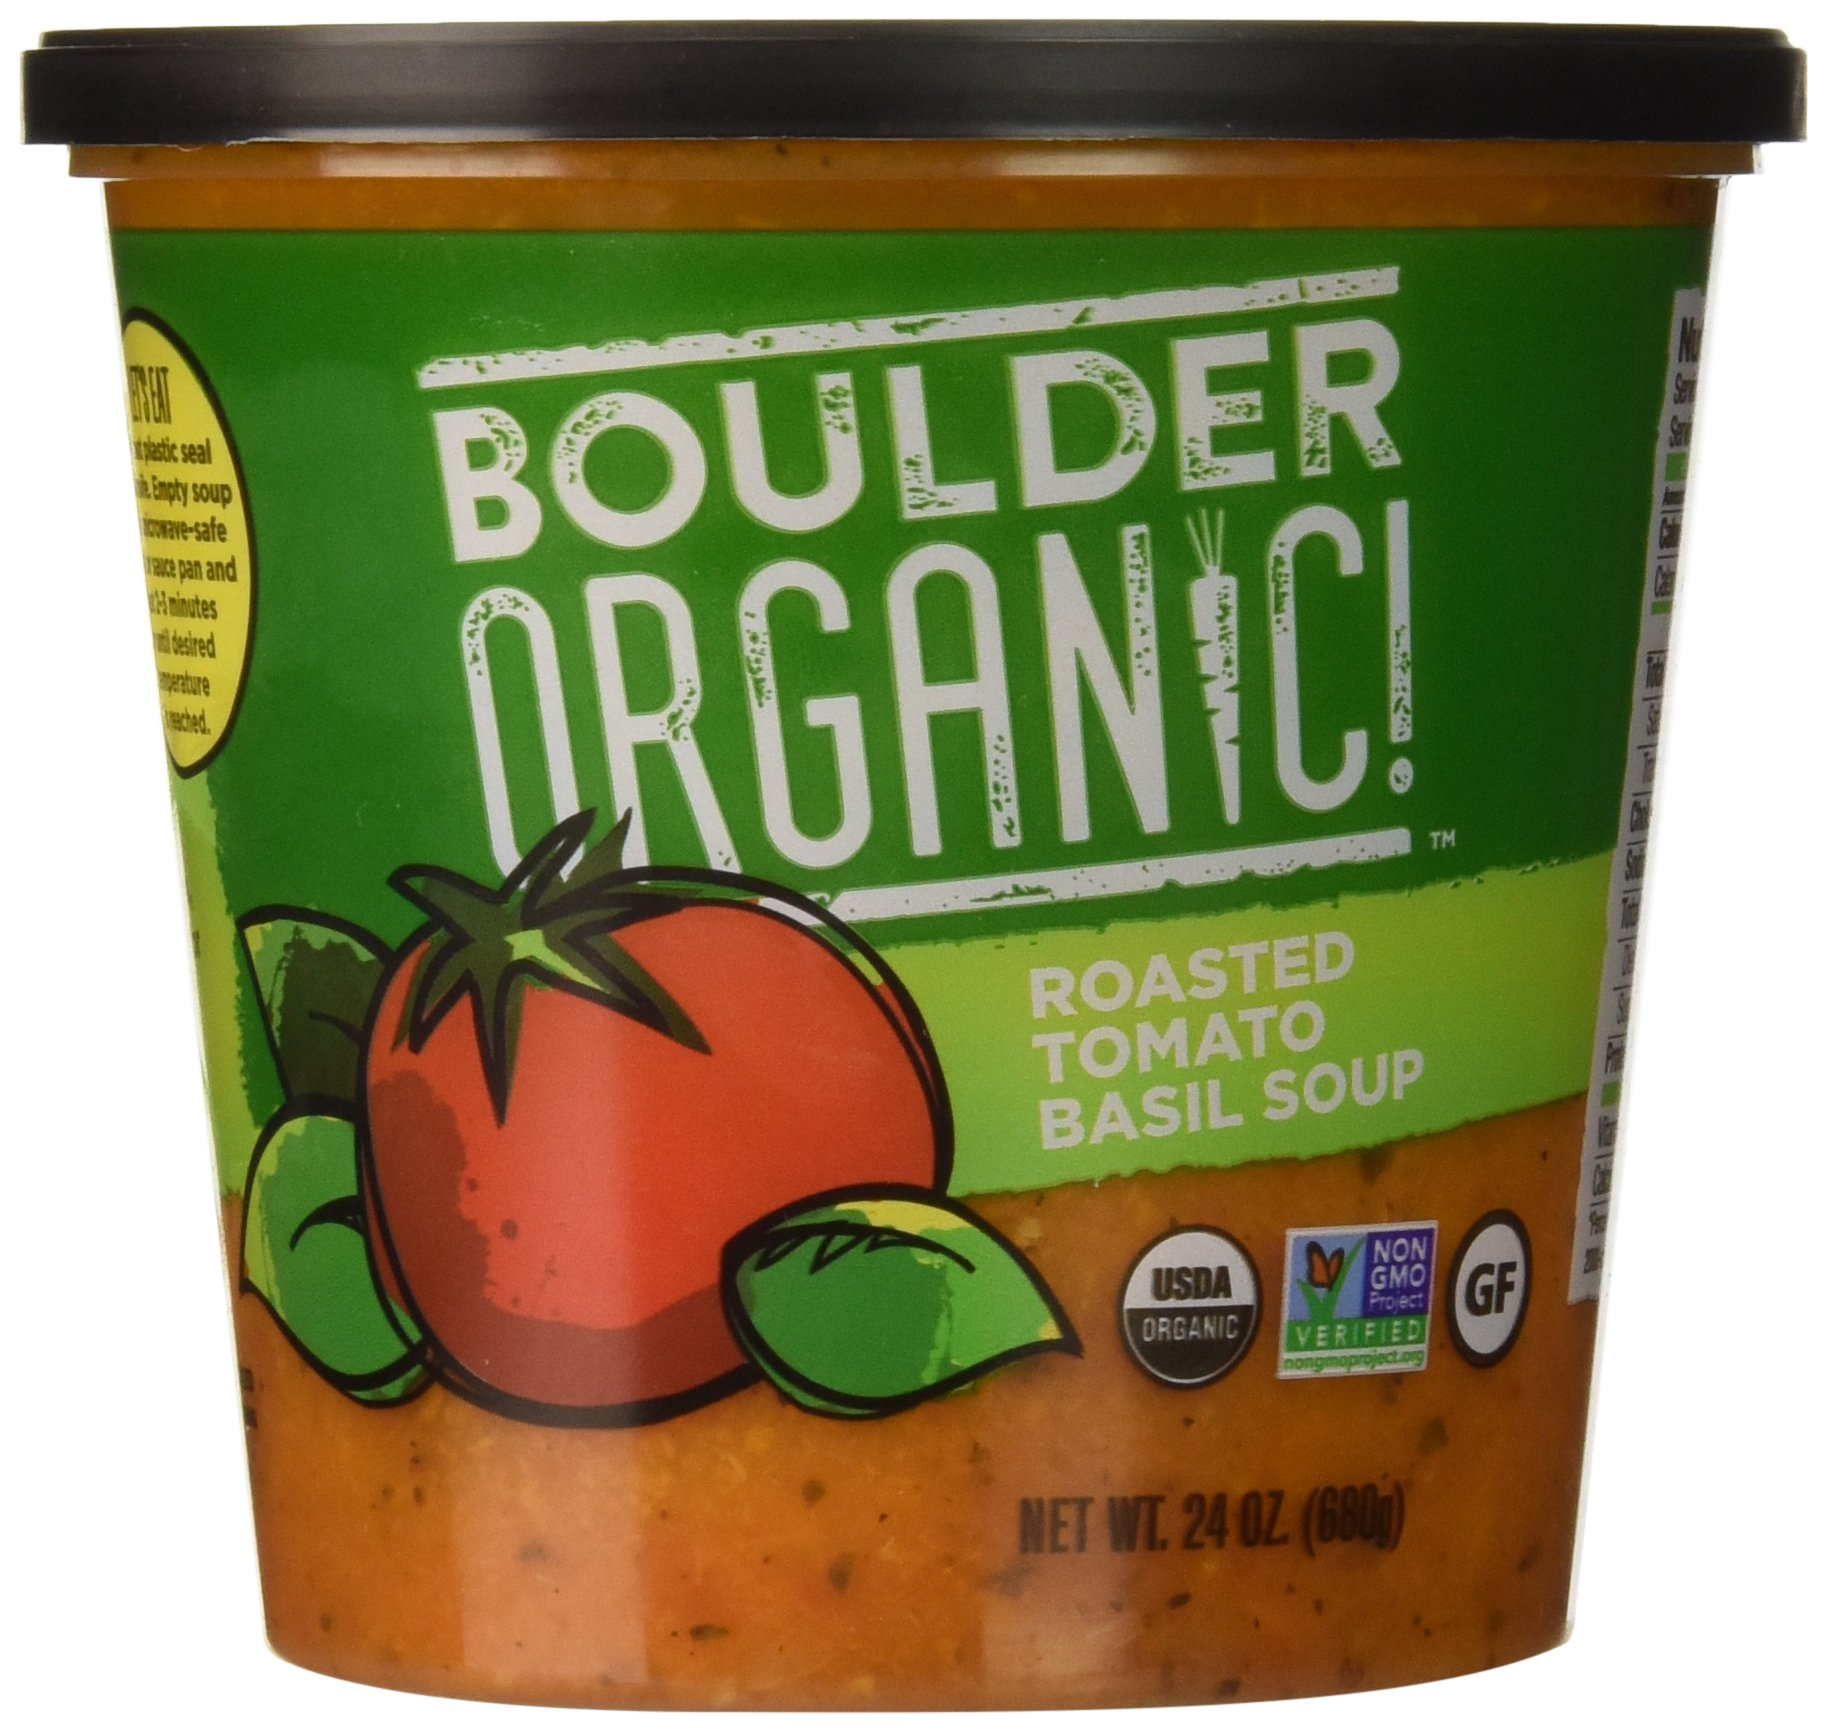 Boulder Organic! Roasted Tomato Basil Soup, 24 oz